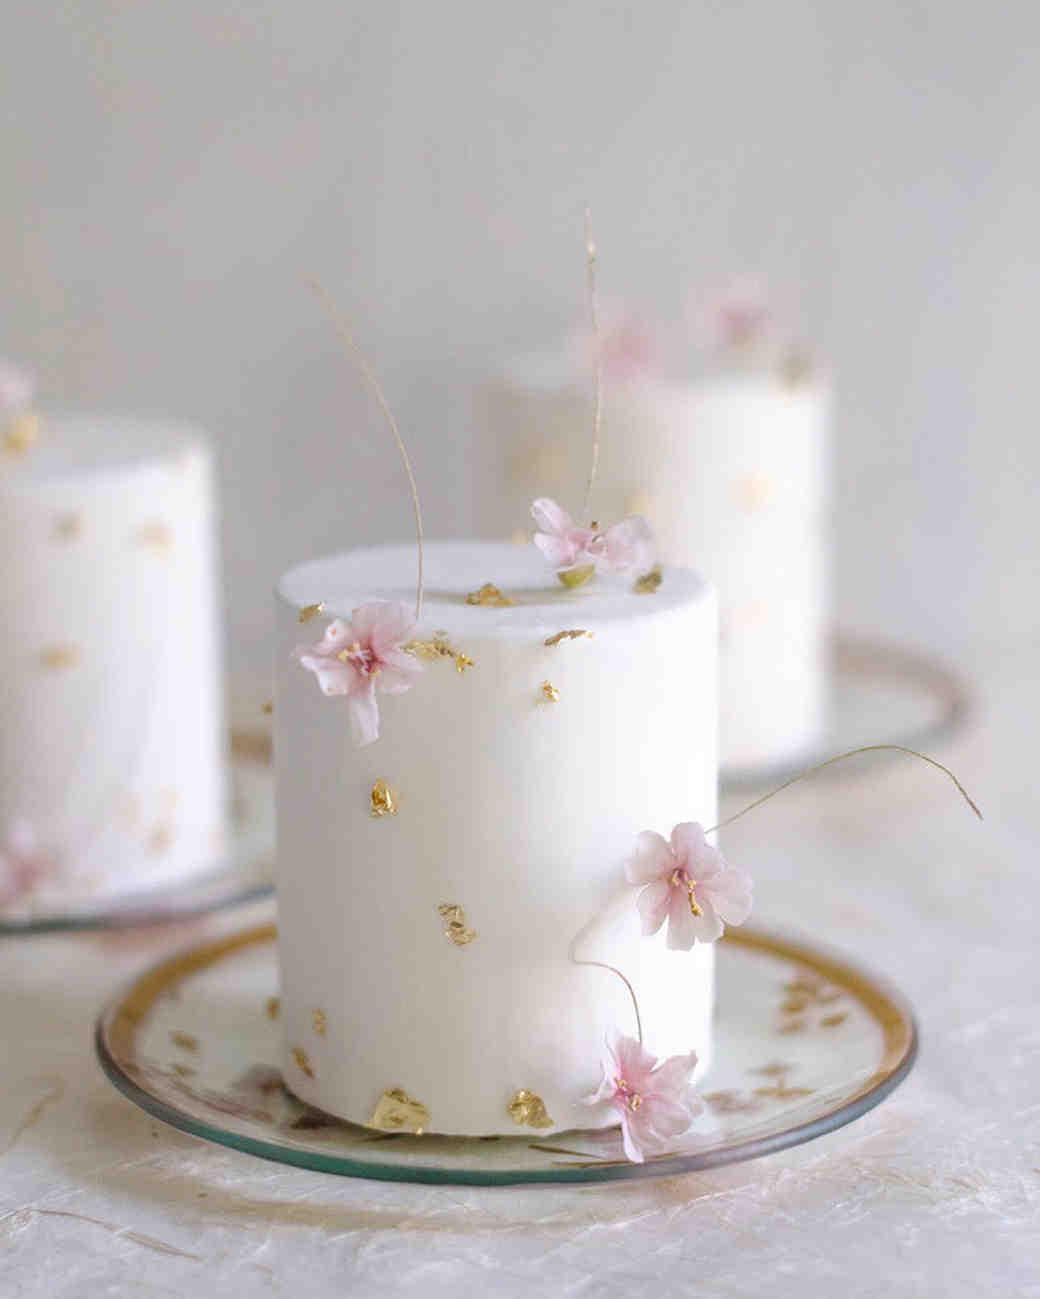 white individual cakes